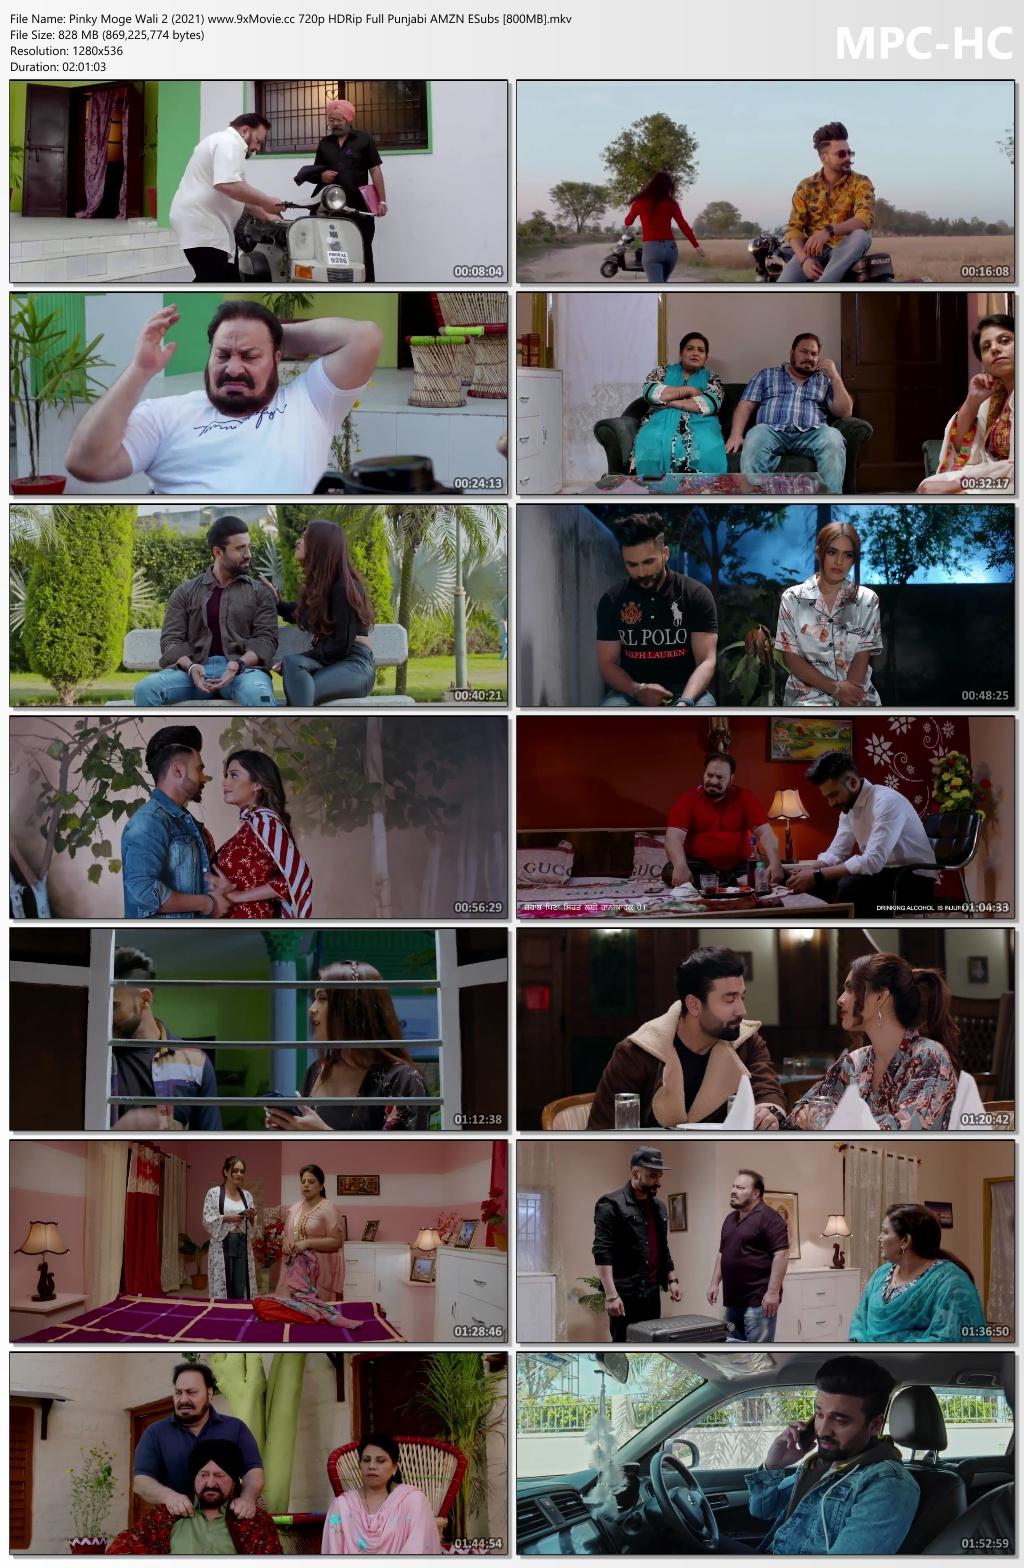 Pinky-Moge-Wali-2-2021-www-9x-Movie-cc-720p-HDRip-Full-Punjabi-AMZN-ESubs-800-MB-mkv